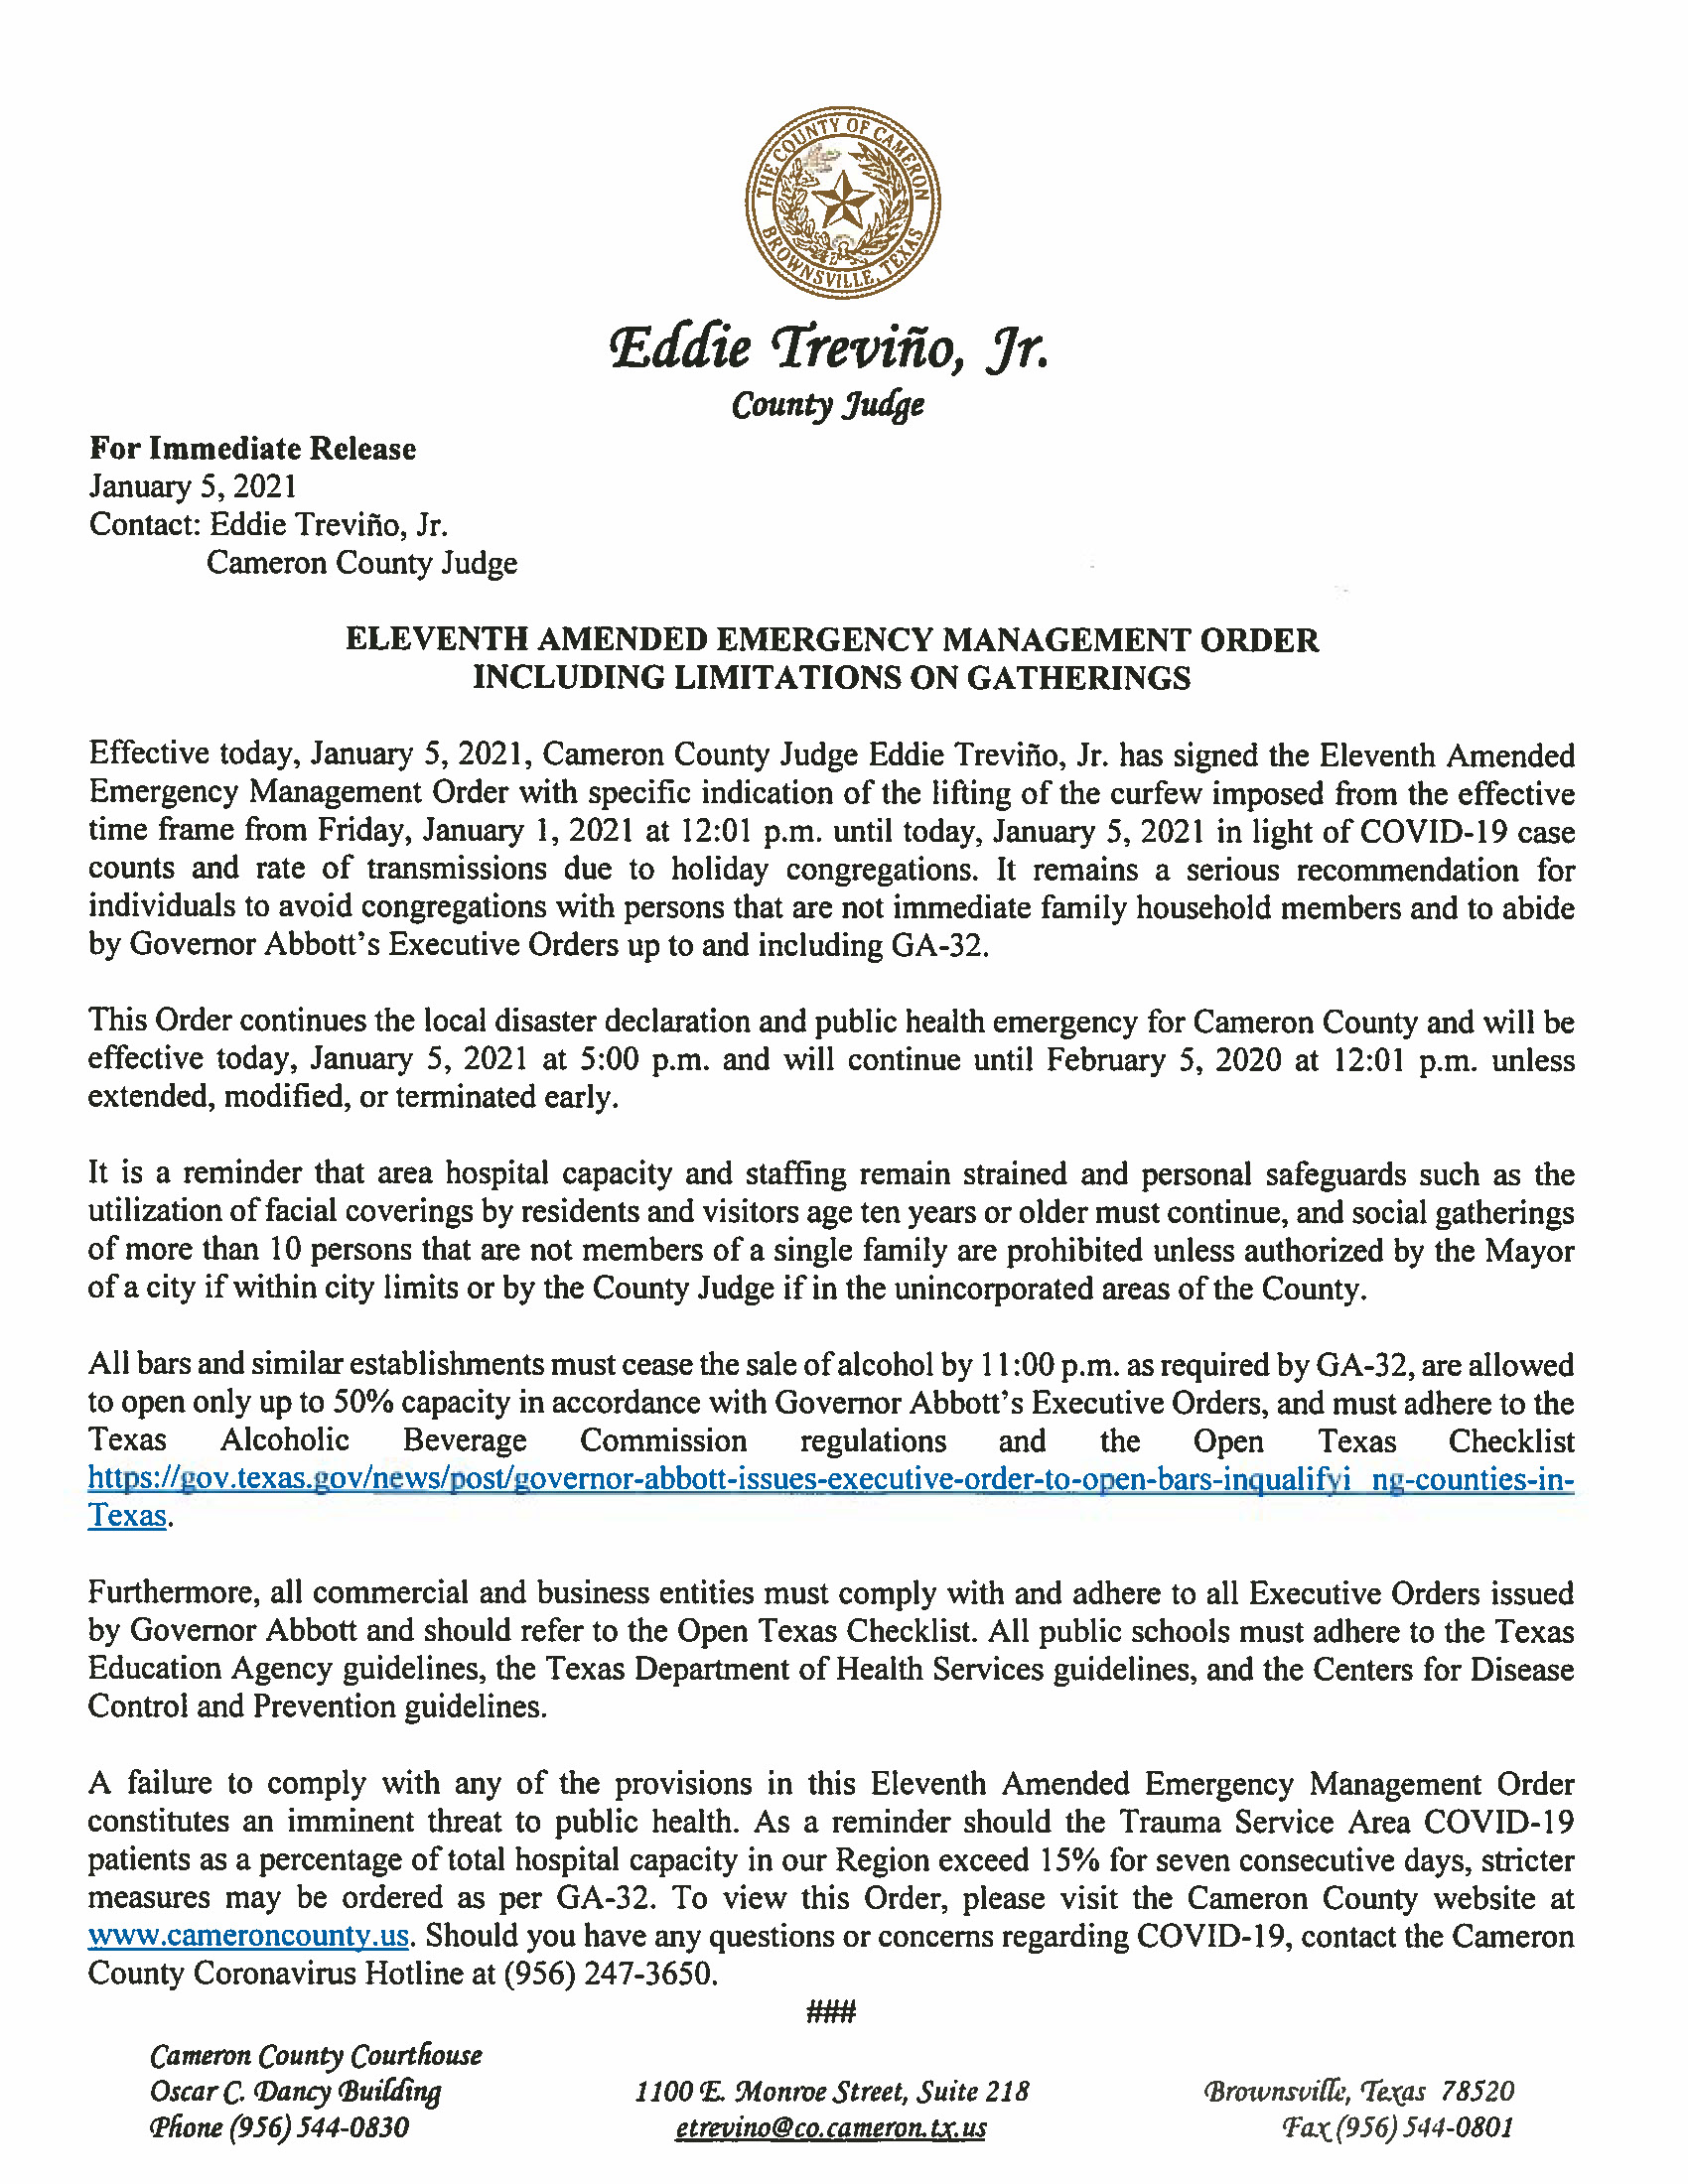 Elevent Amended Emergency Management Order Press Release